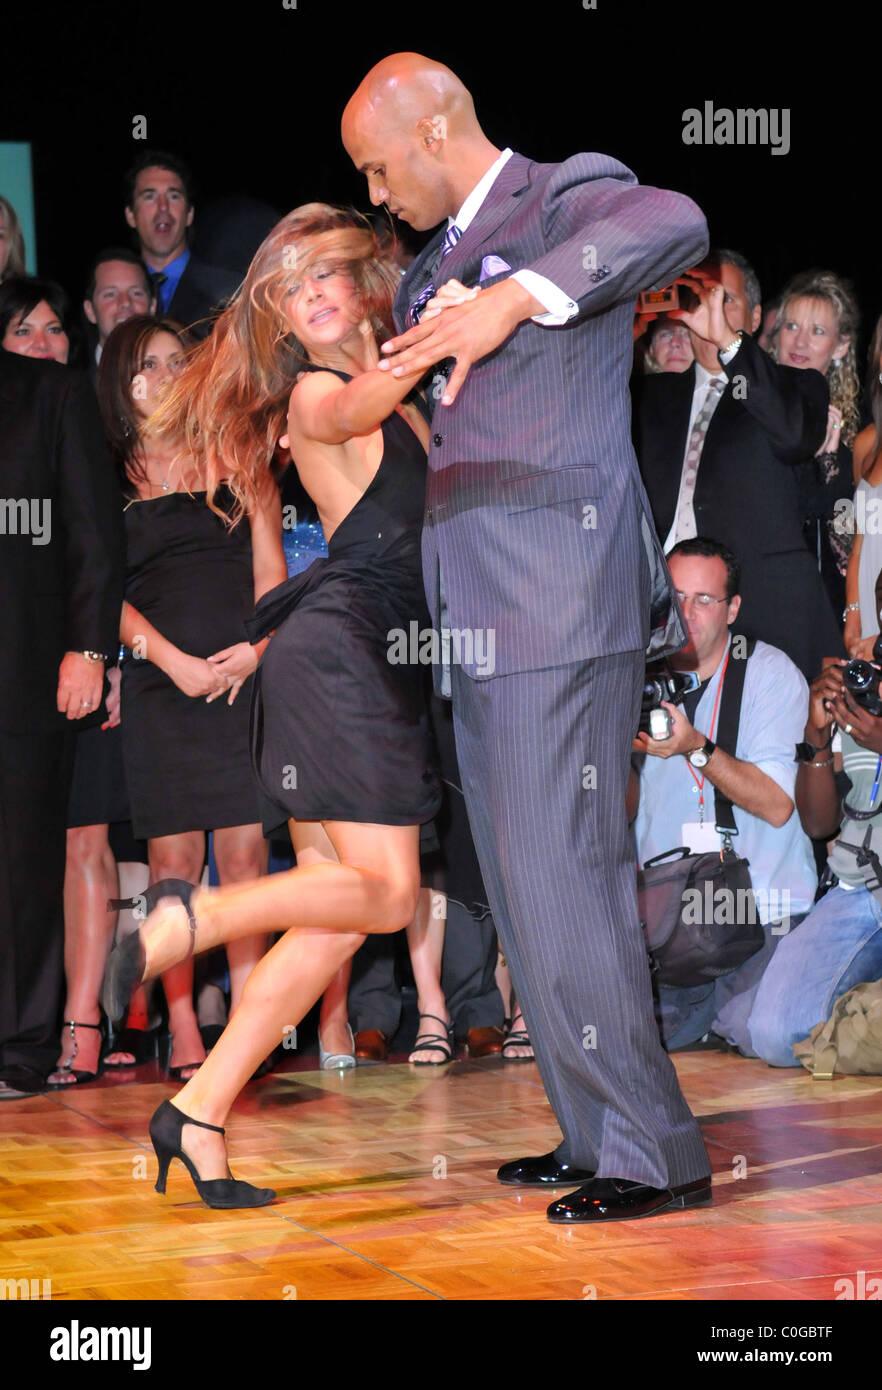 Jason taylor and edyta sliwinska dating